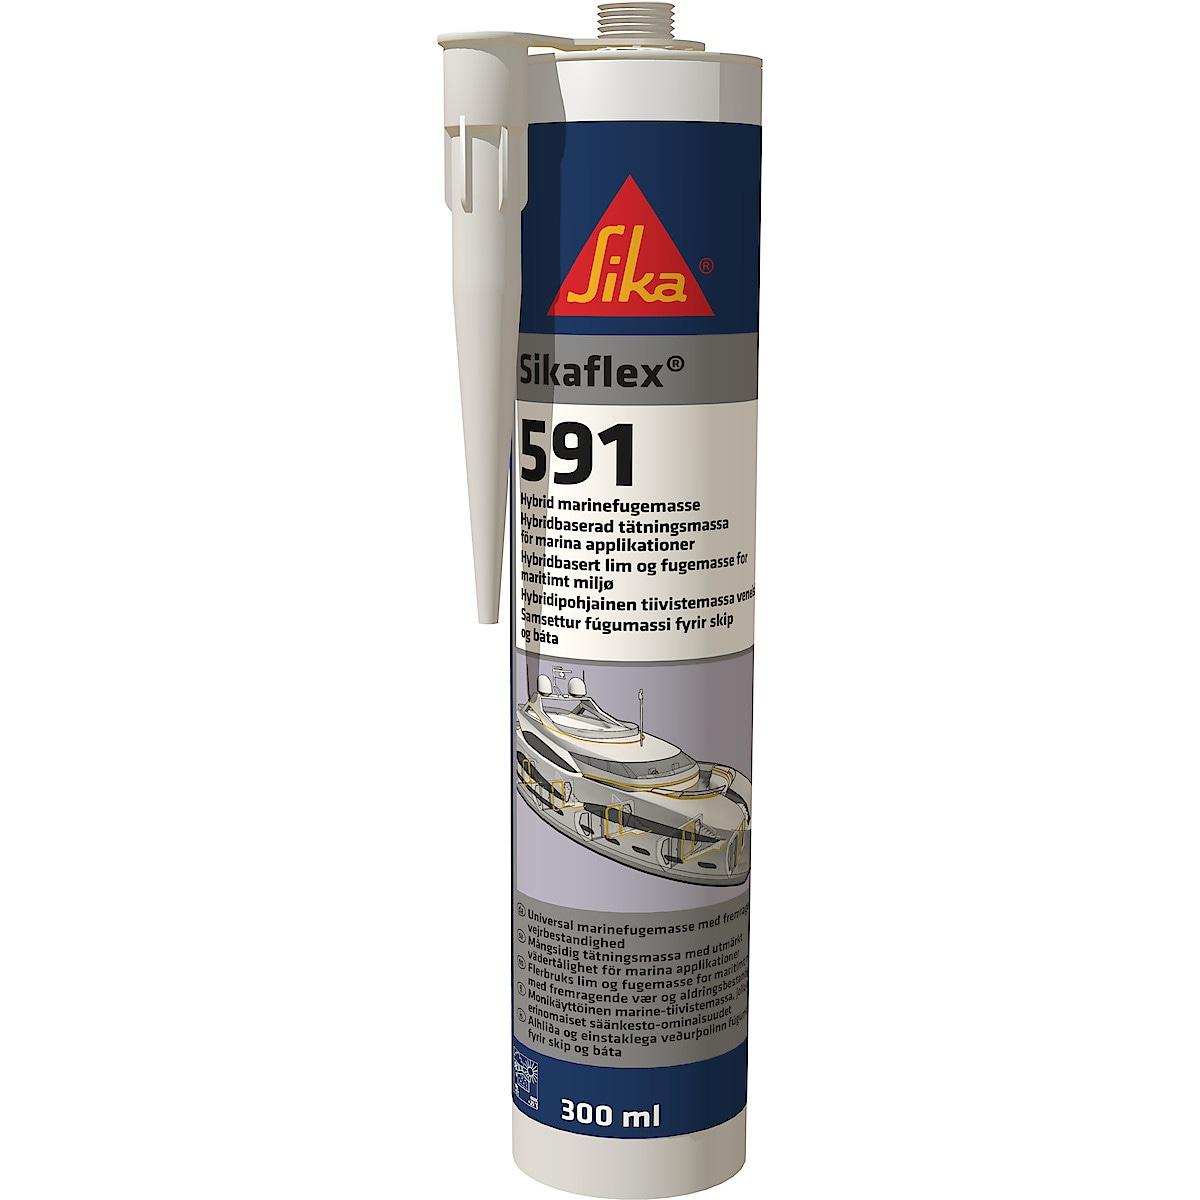 Sikaflex 591 lim-/tette-/fugemasse